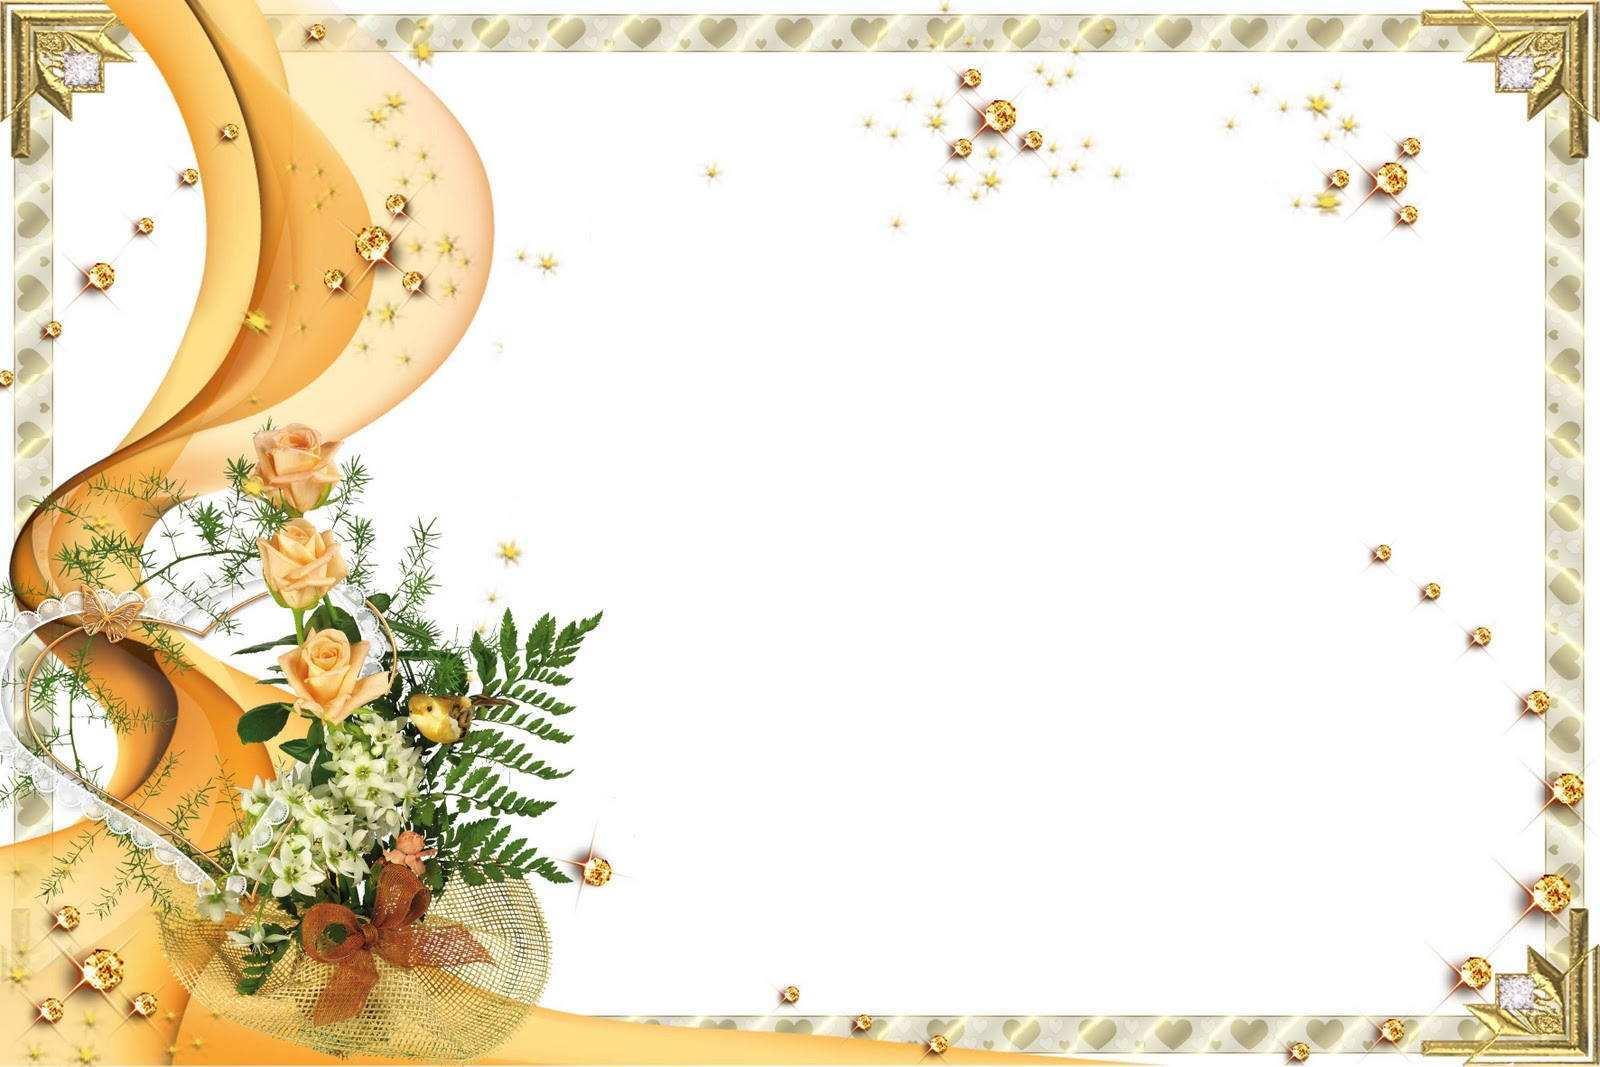 39 Free Blank Engagement Invitation Templates Hd for Ms Word with Blank Engagement Invitation Templates Hd